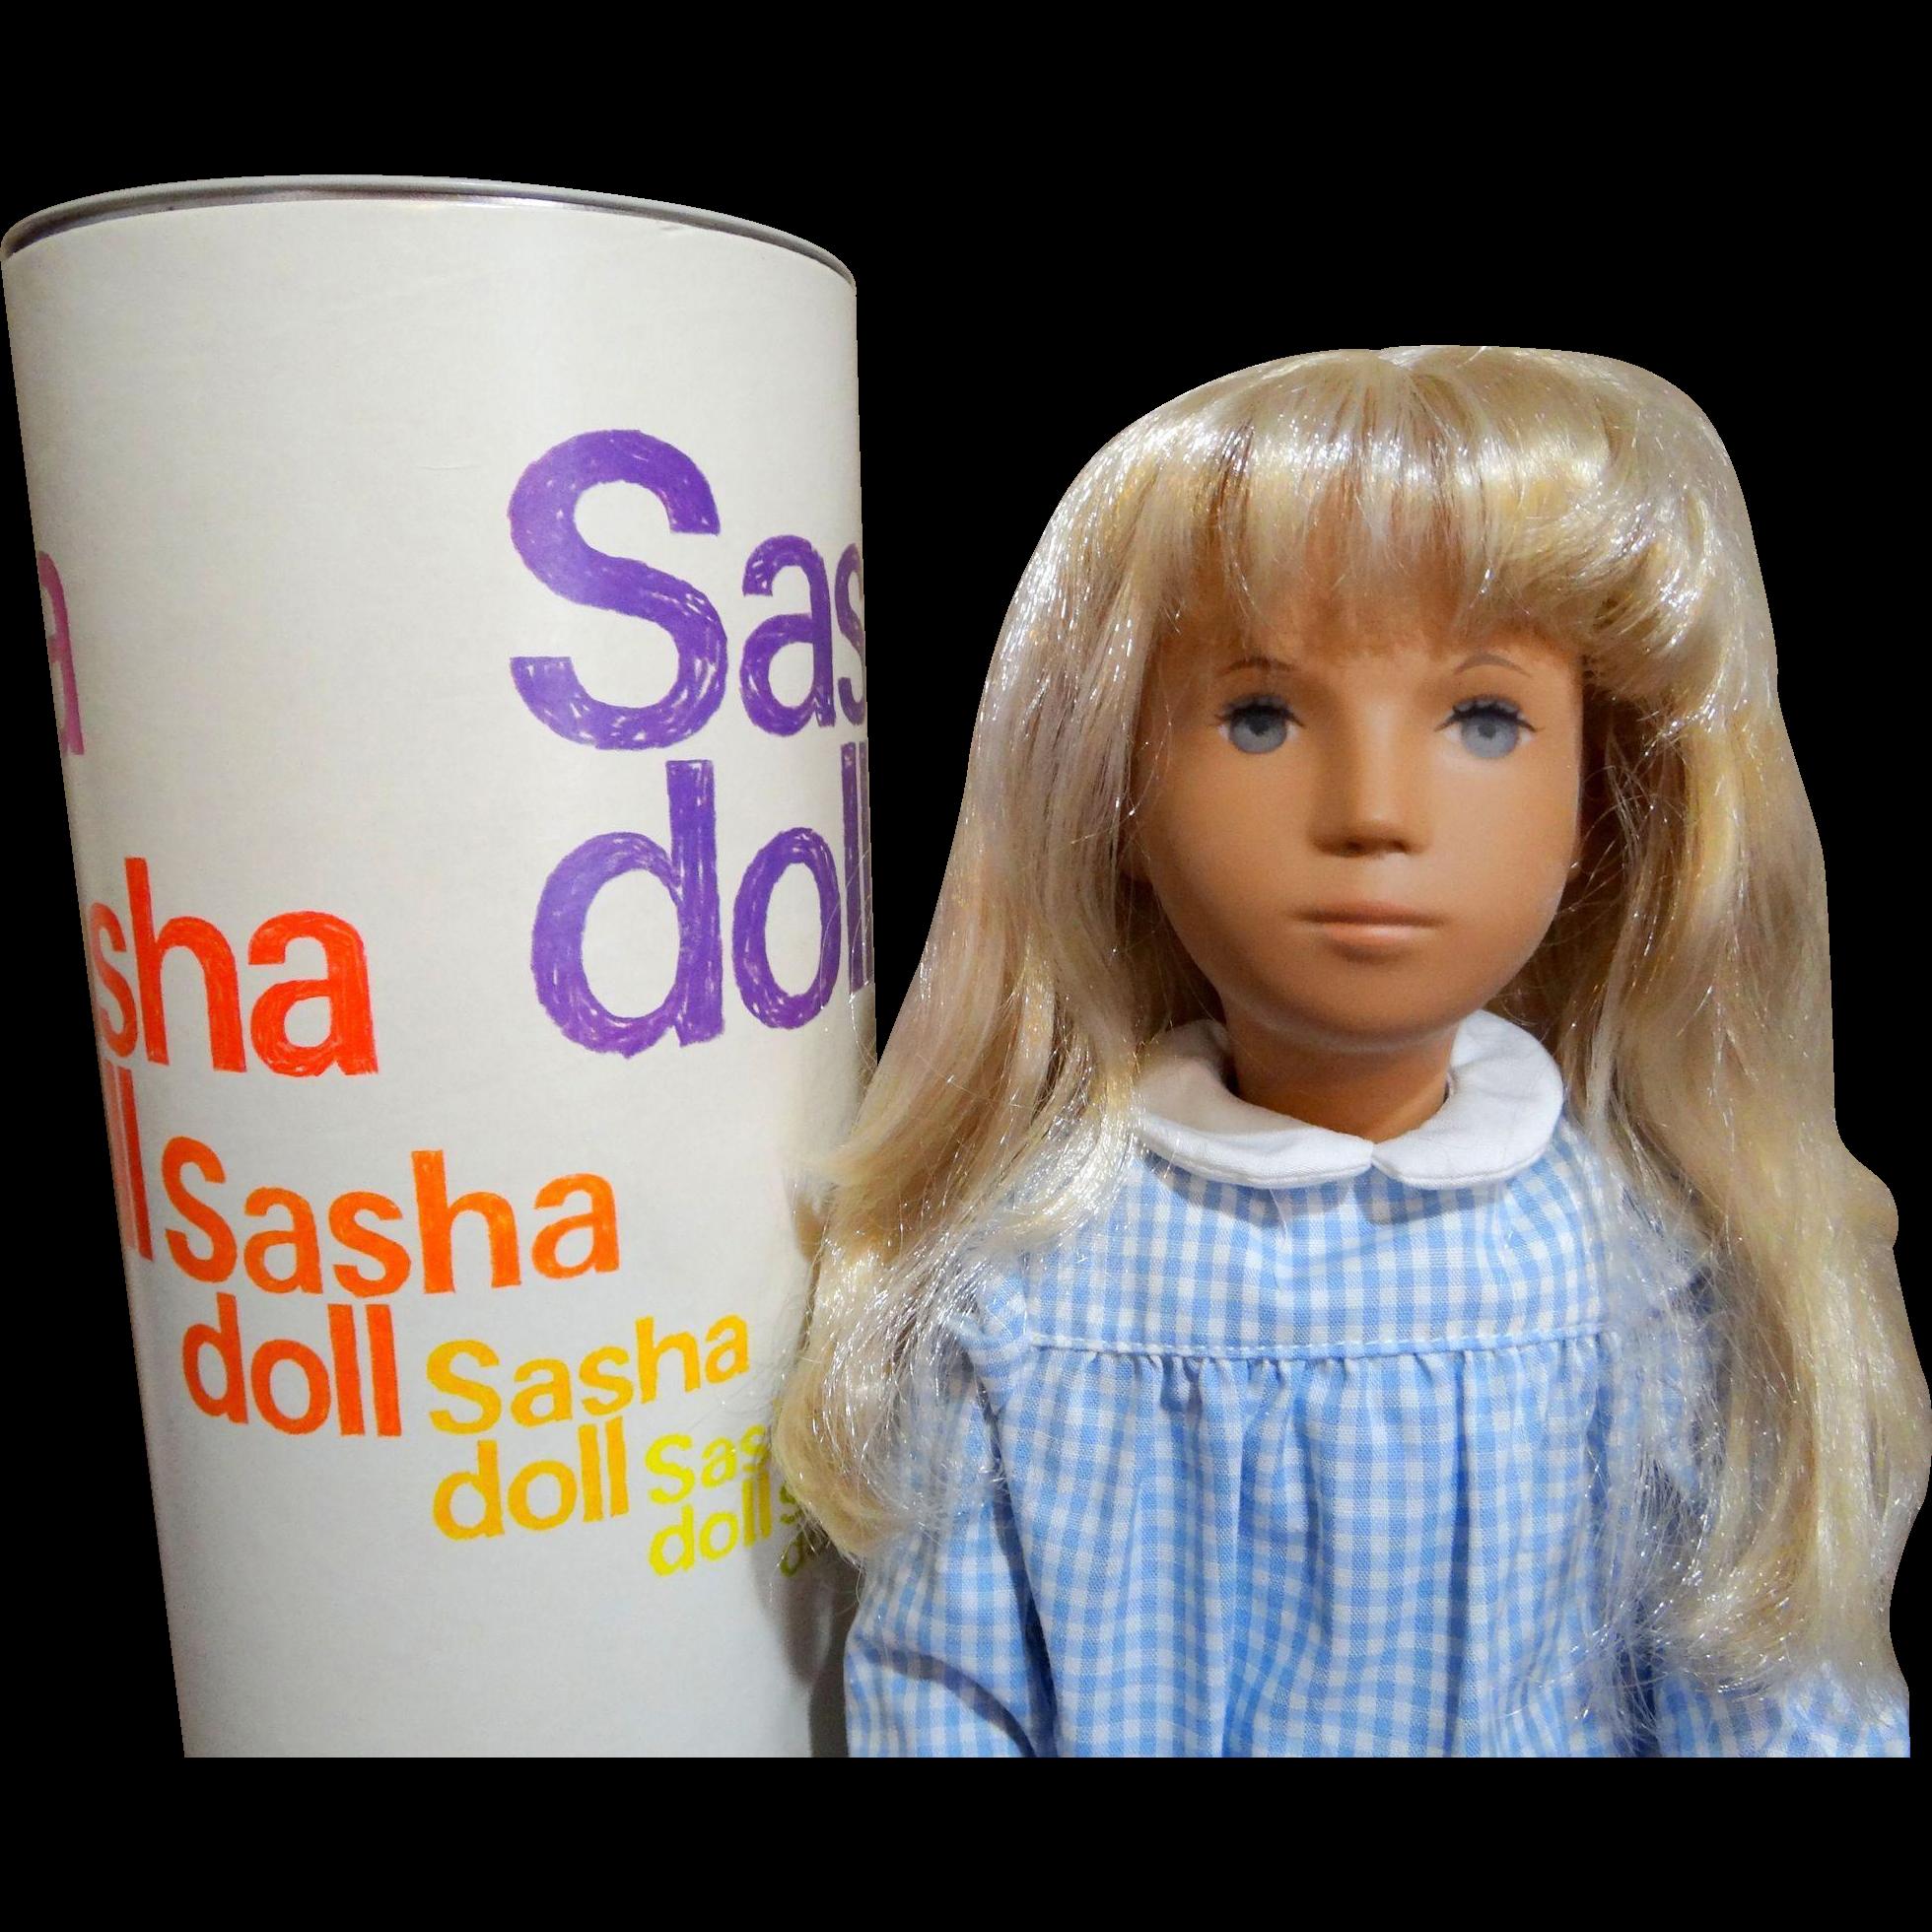 Vintage 1969 Blonde Gingham 4-107 Sasha Doll Star Pupils Trendon Toys England w/ Tube